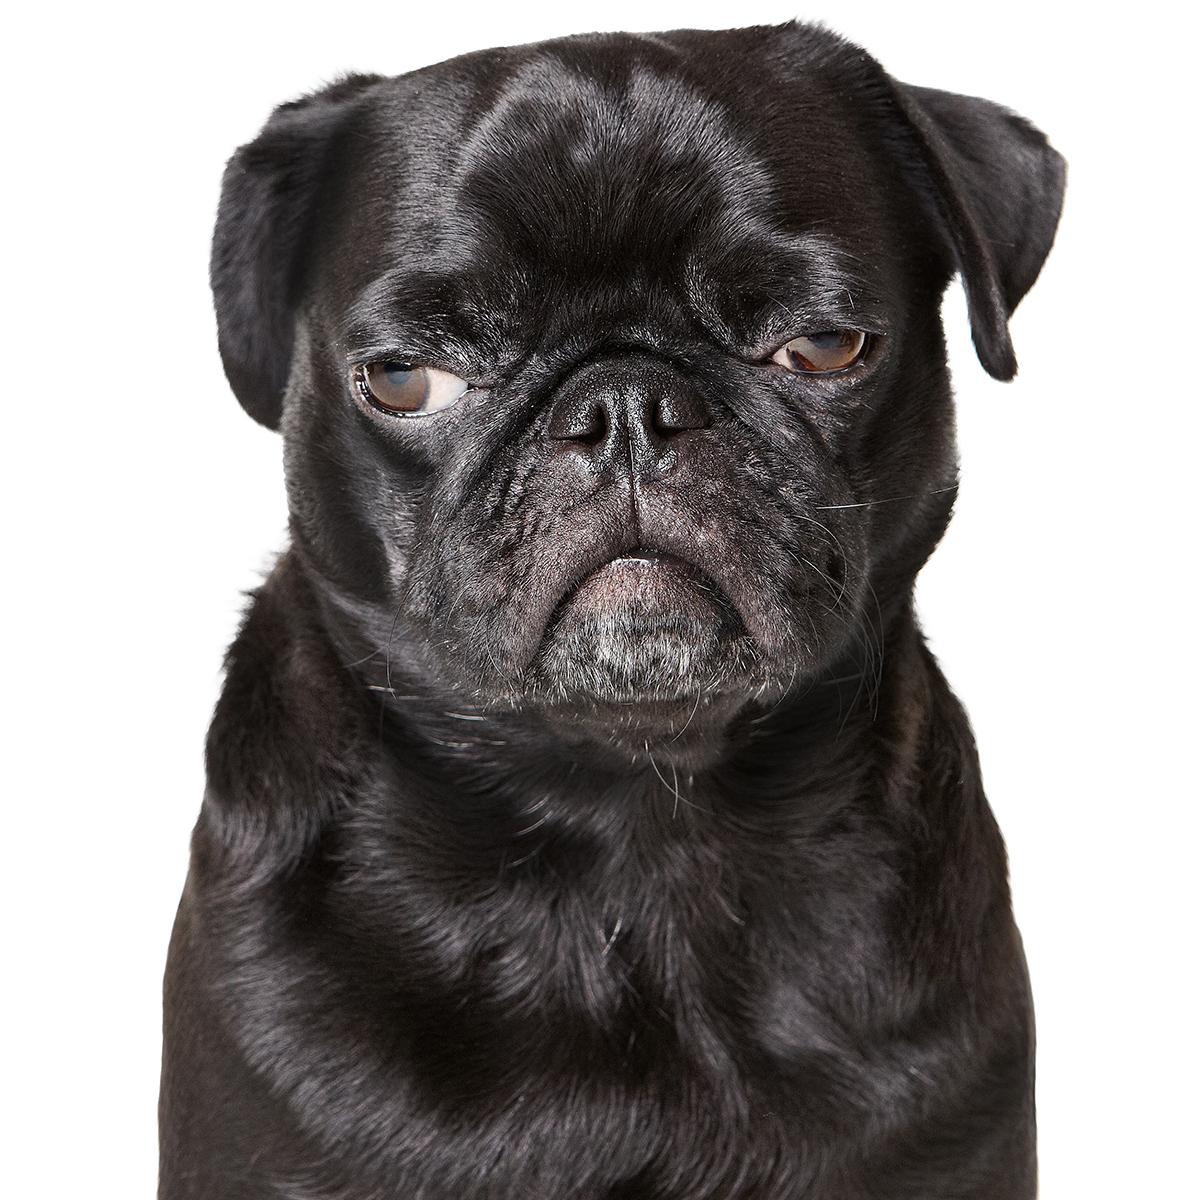 pet-pug-rachael-ray-0317-102908327